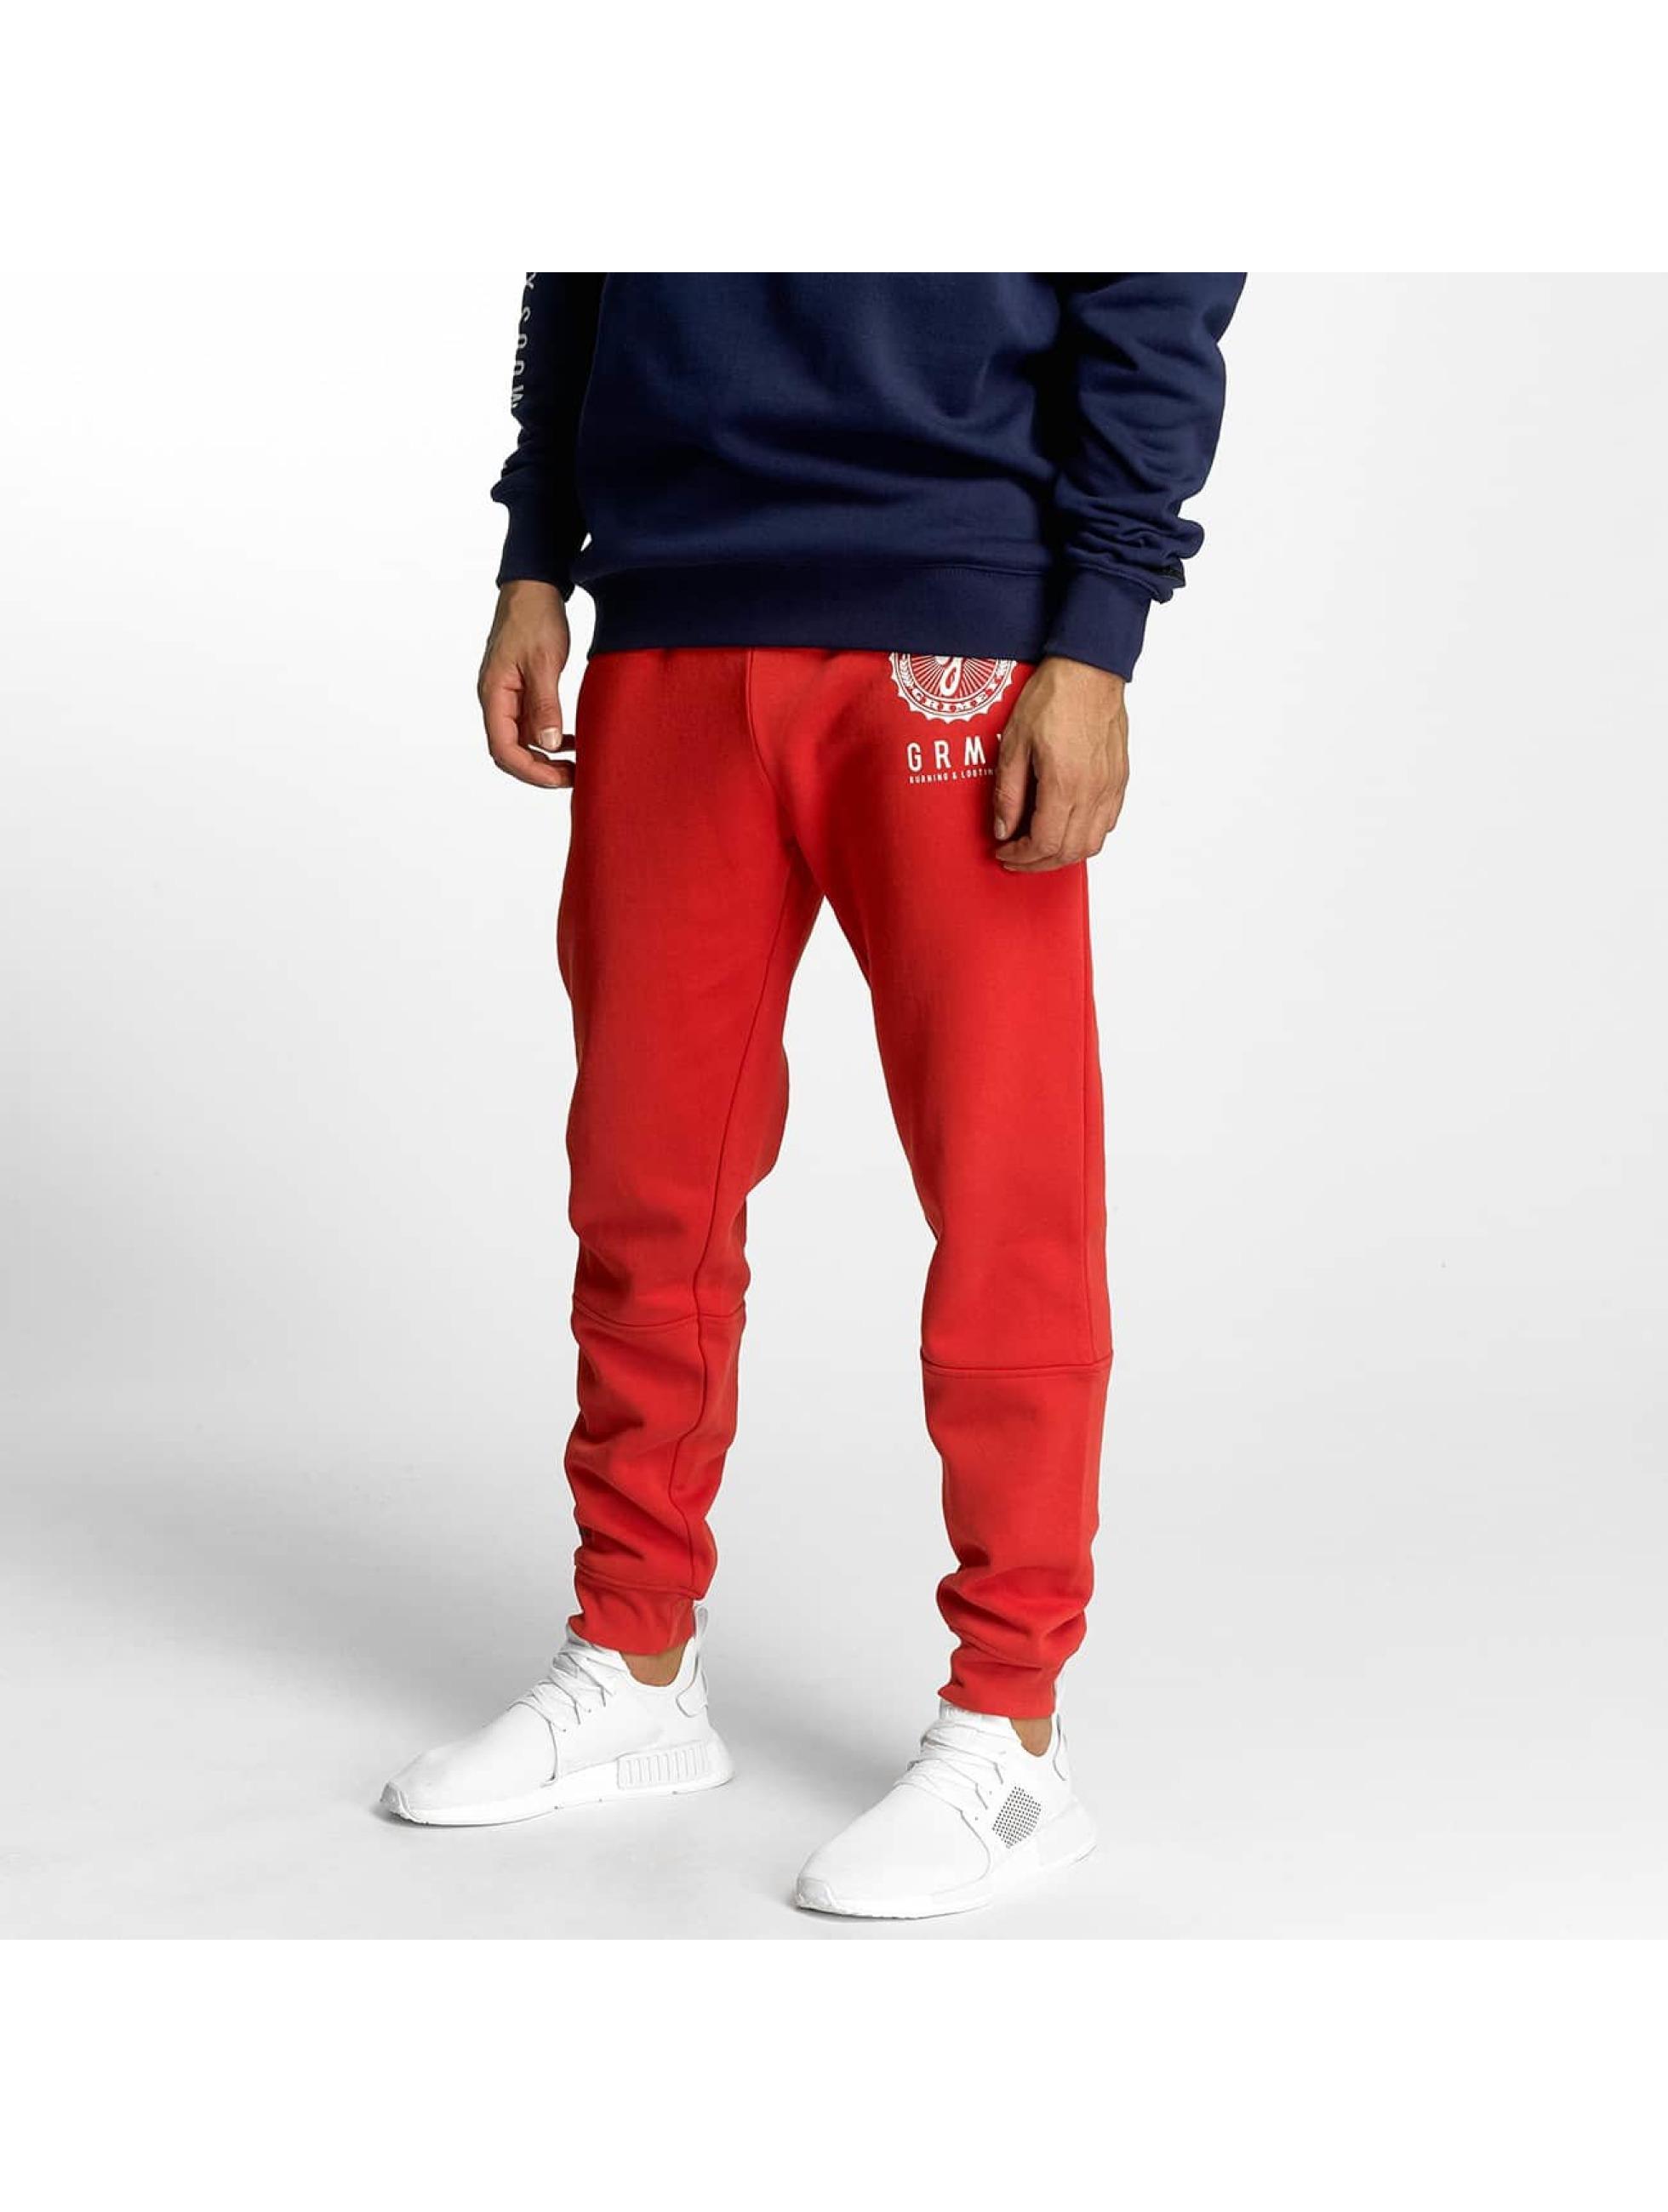 Grimey Wear Männer Jogginghose Core in rot - broschei